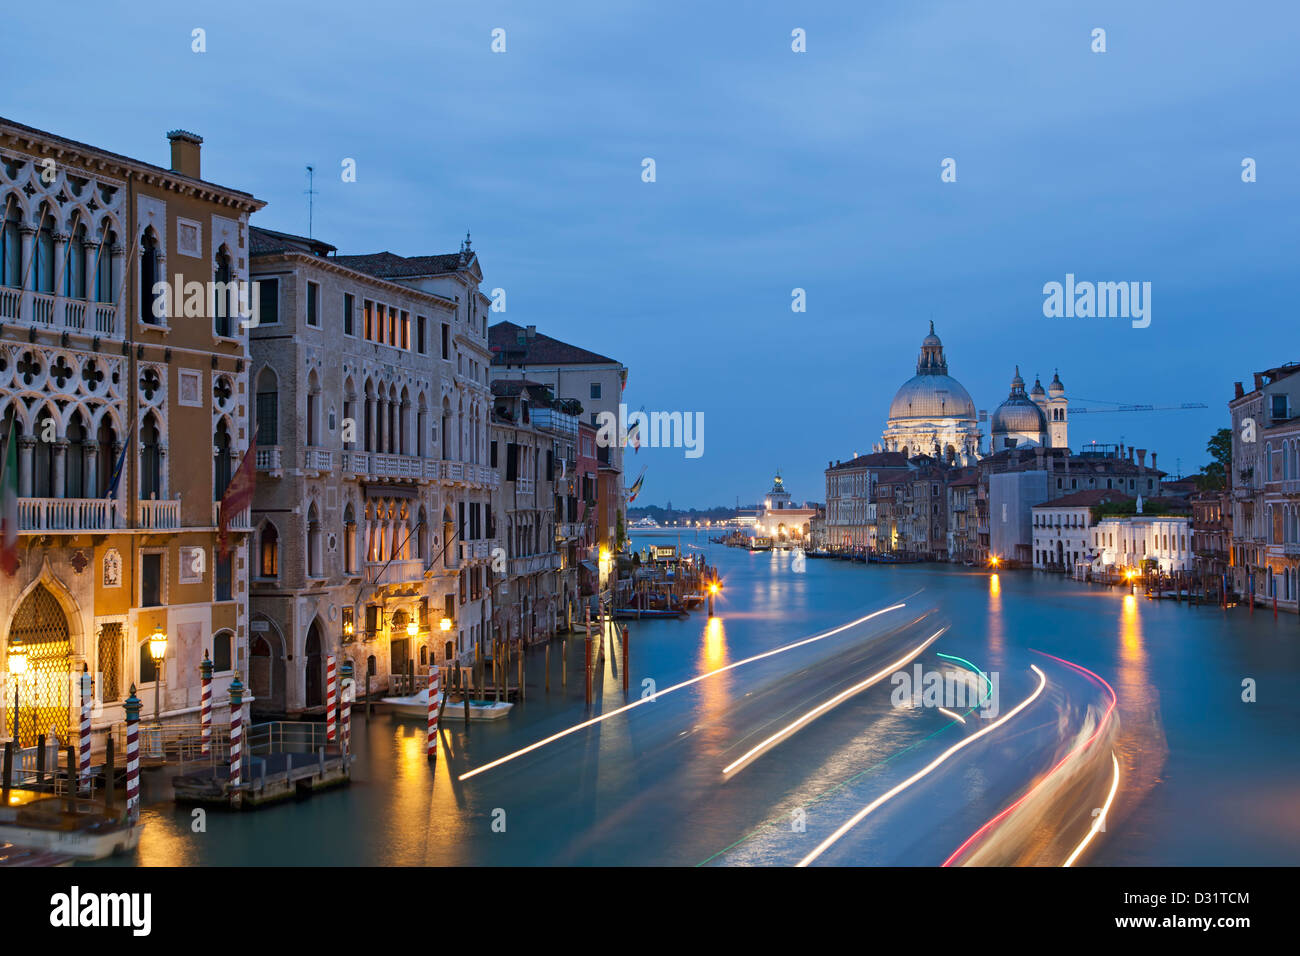 Light streaks on Grand Canal and Santa Maria della Salute Church, Venice, Italy - Stock Image